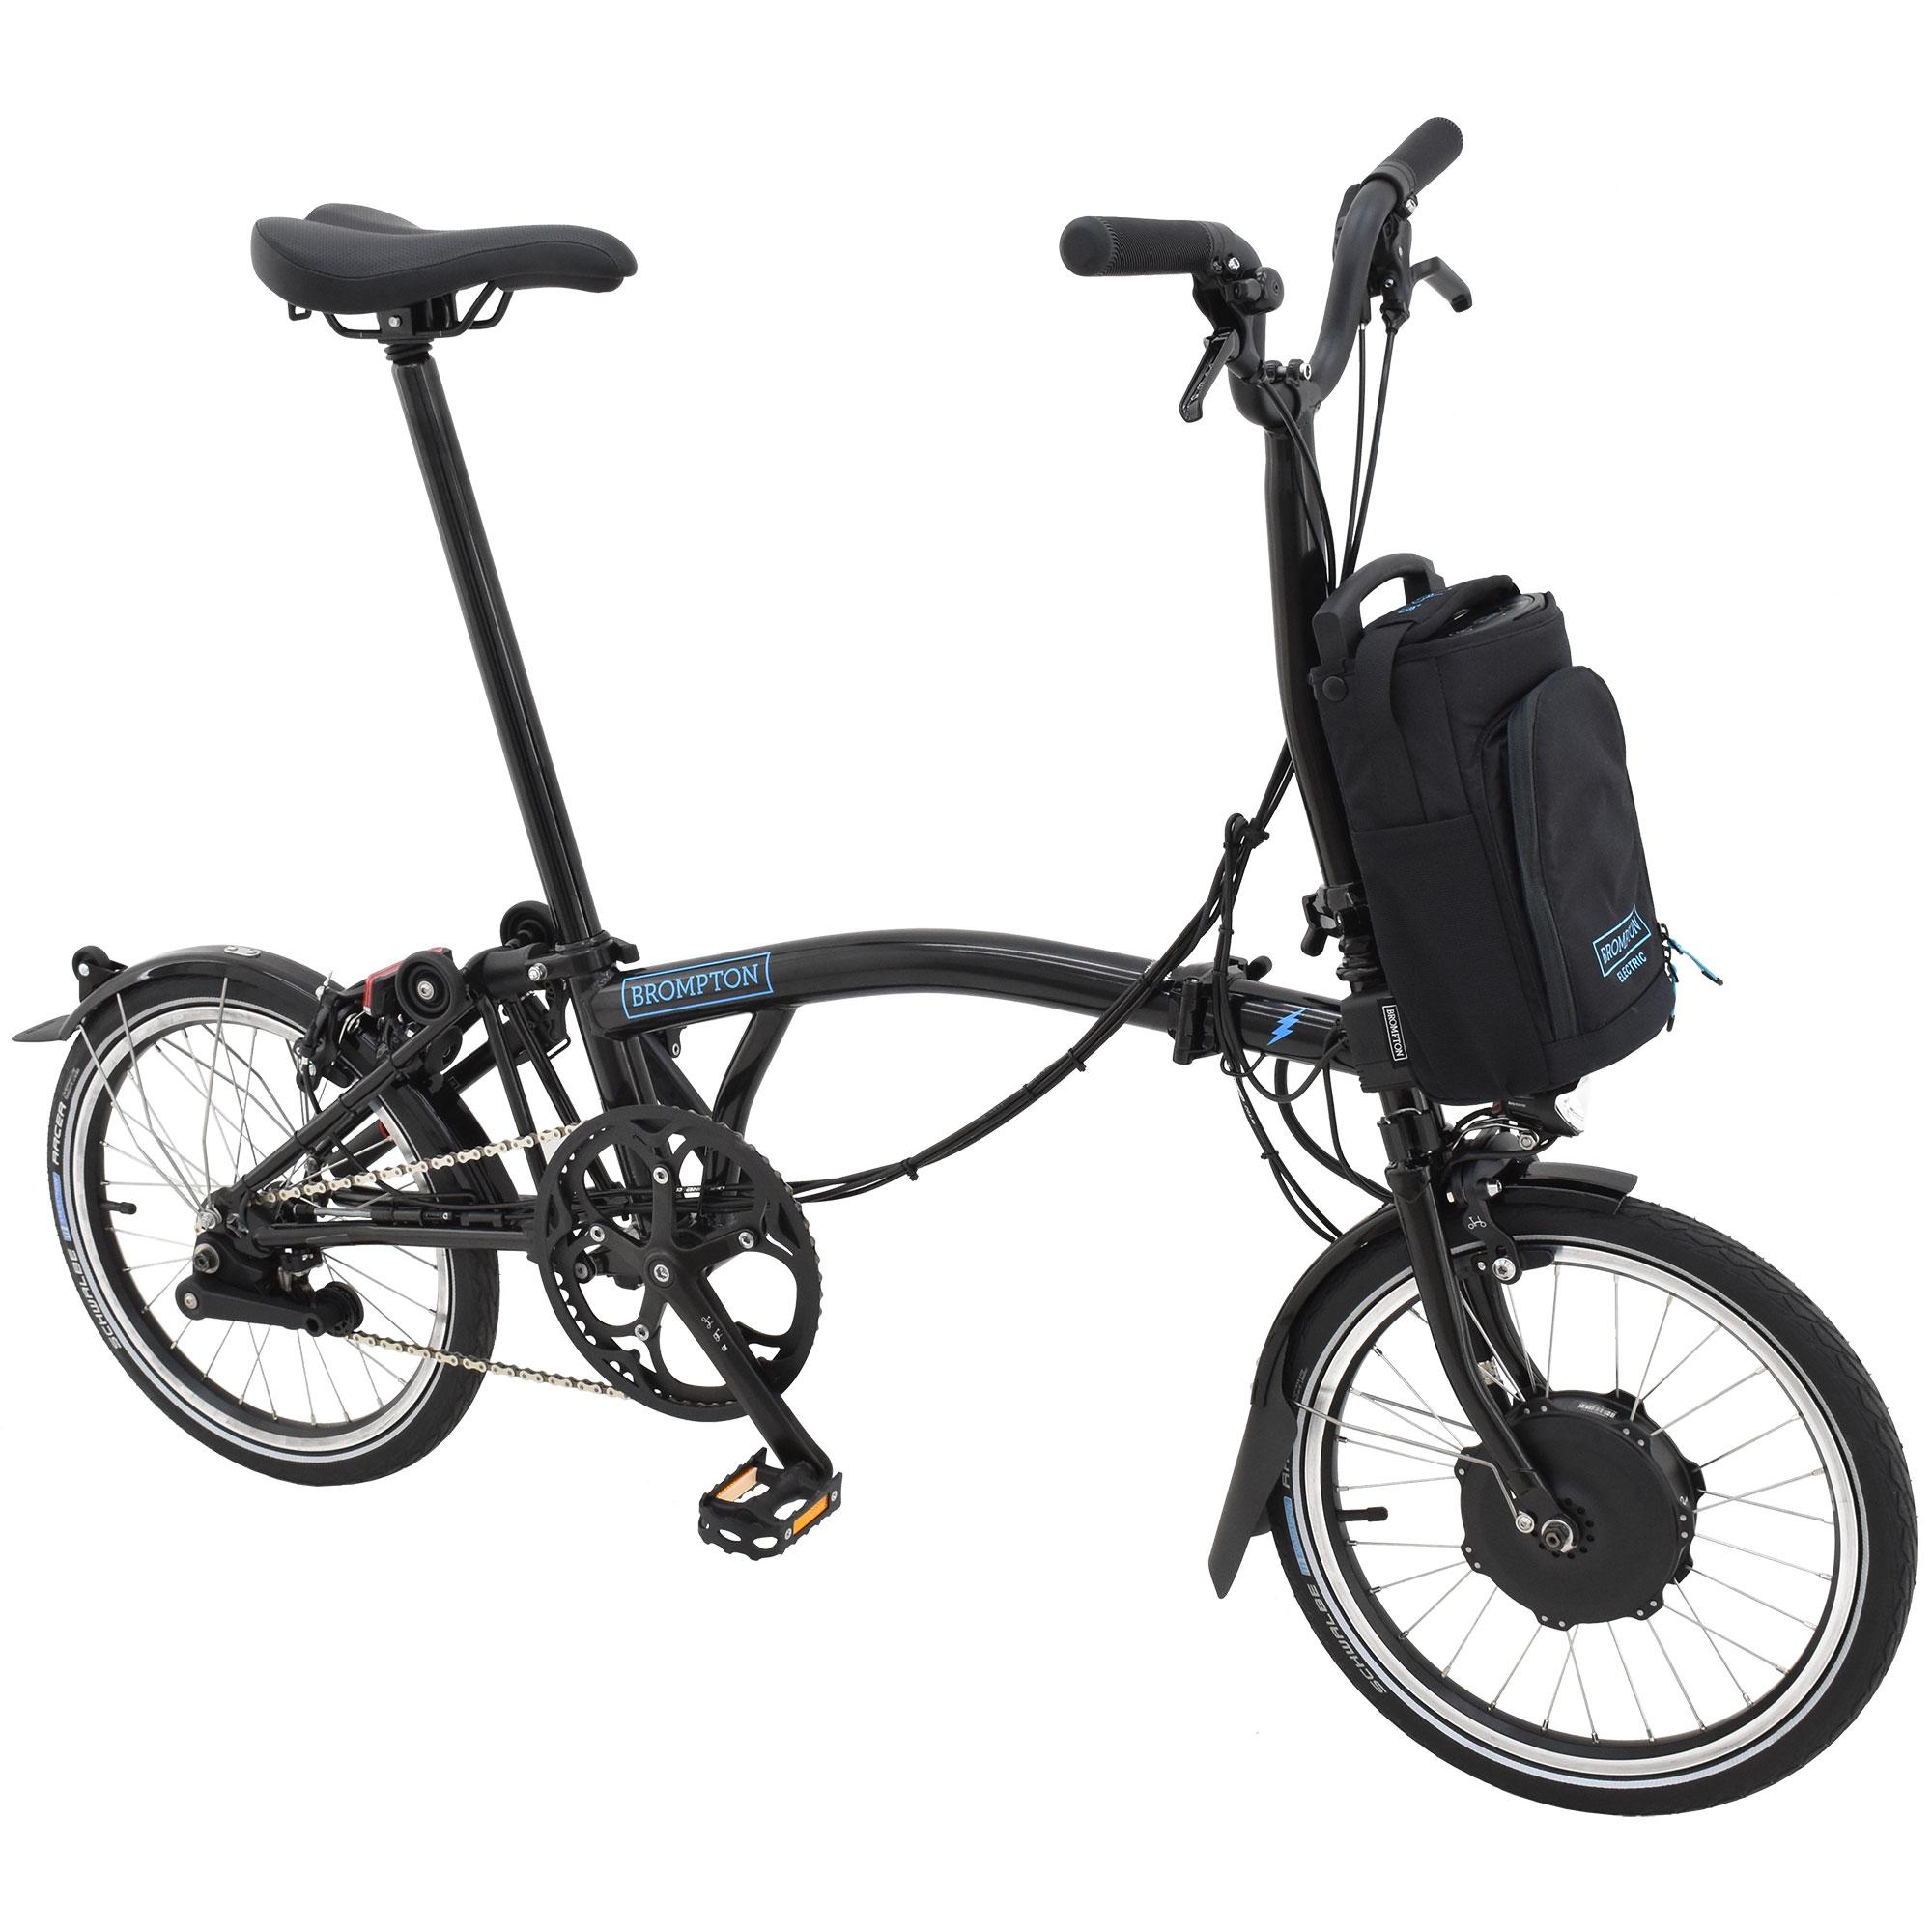 5318baed66f Brompton Electric M2L 2019 Folding Bike